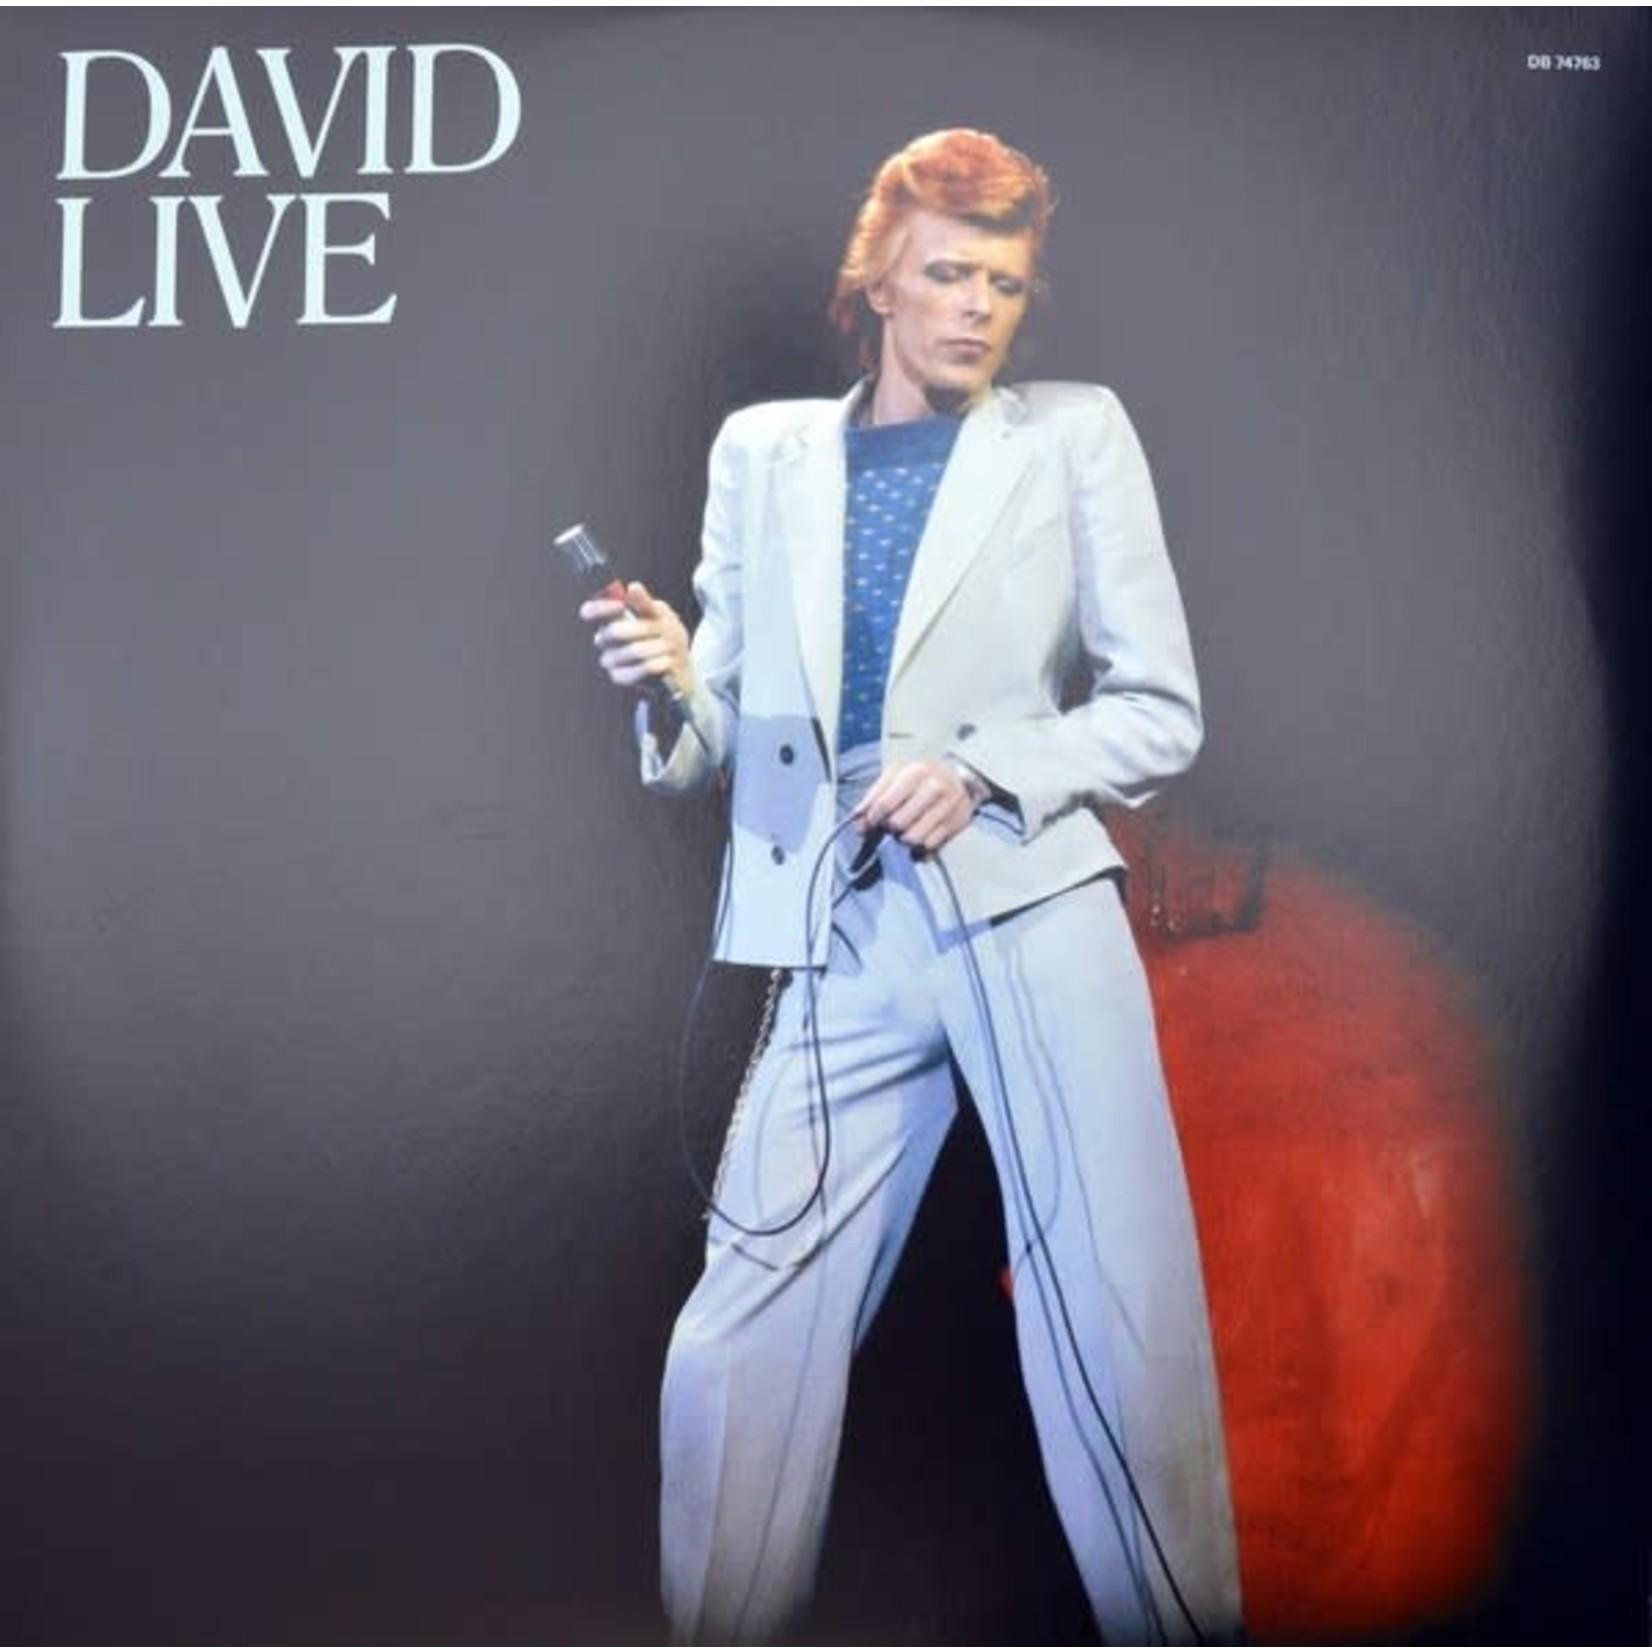 DAVID BOWIE DAVID LIVE  2005 MIX  REMASTERED 3LP